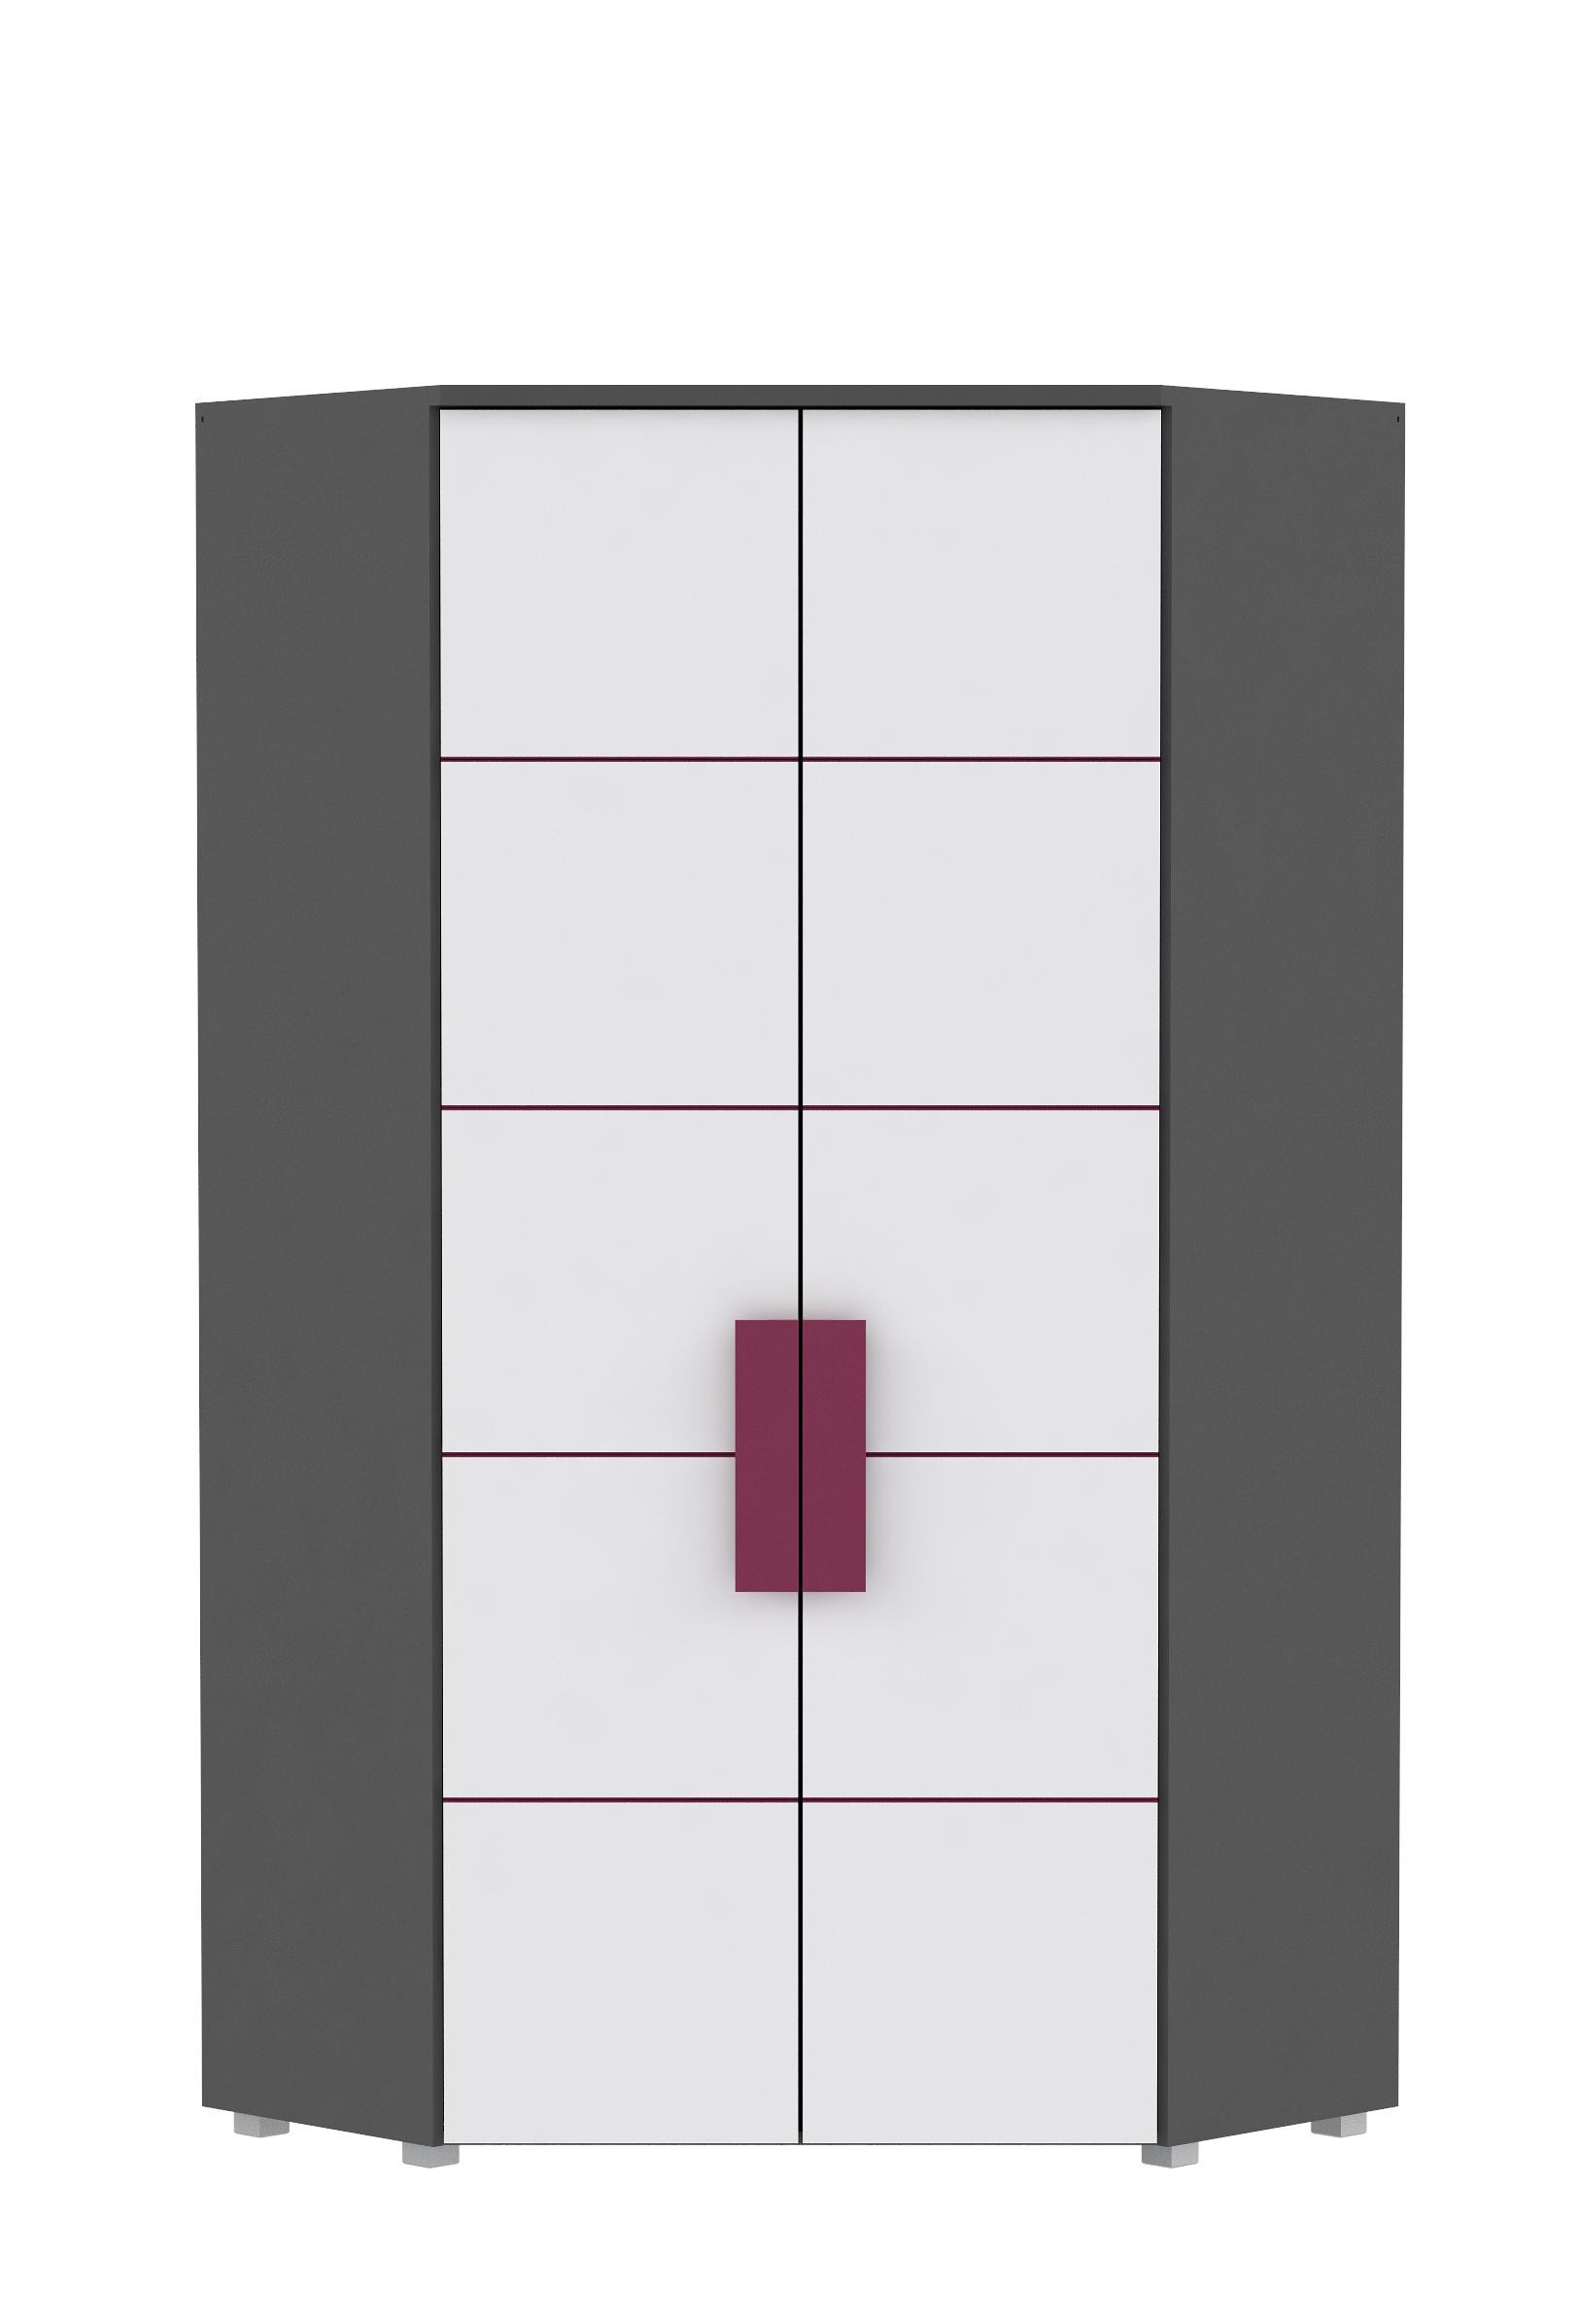 Eckkleiderschrank in Grau Weiß Trinity 2-türig